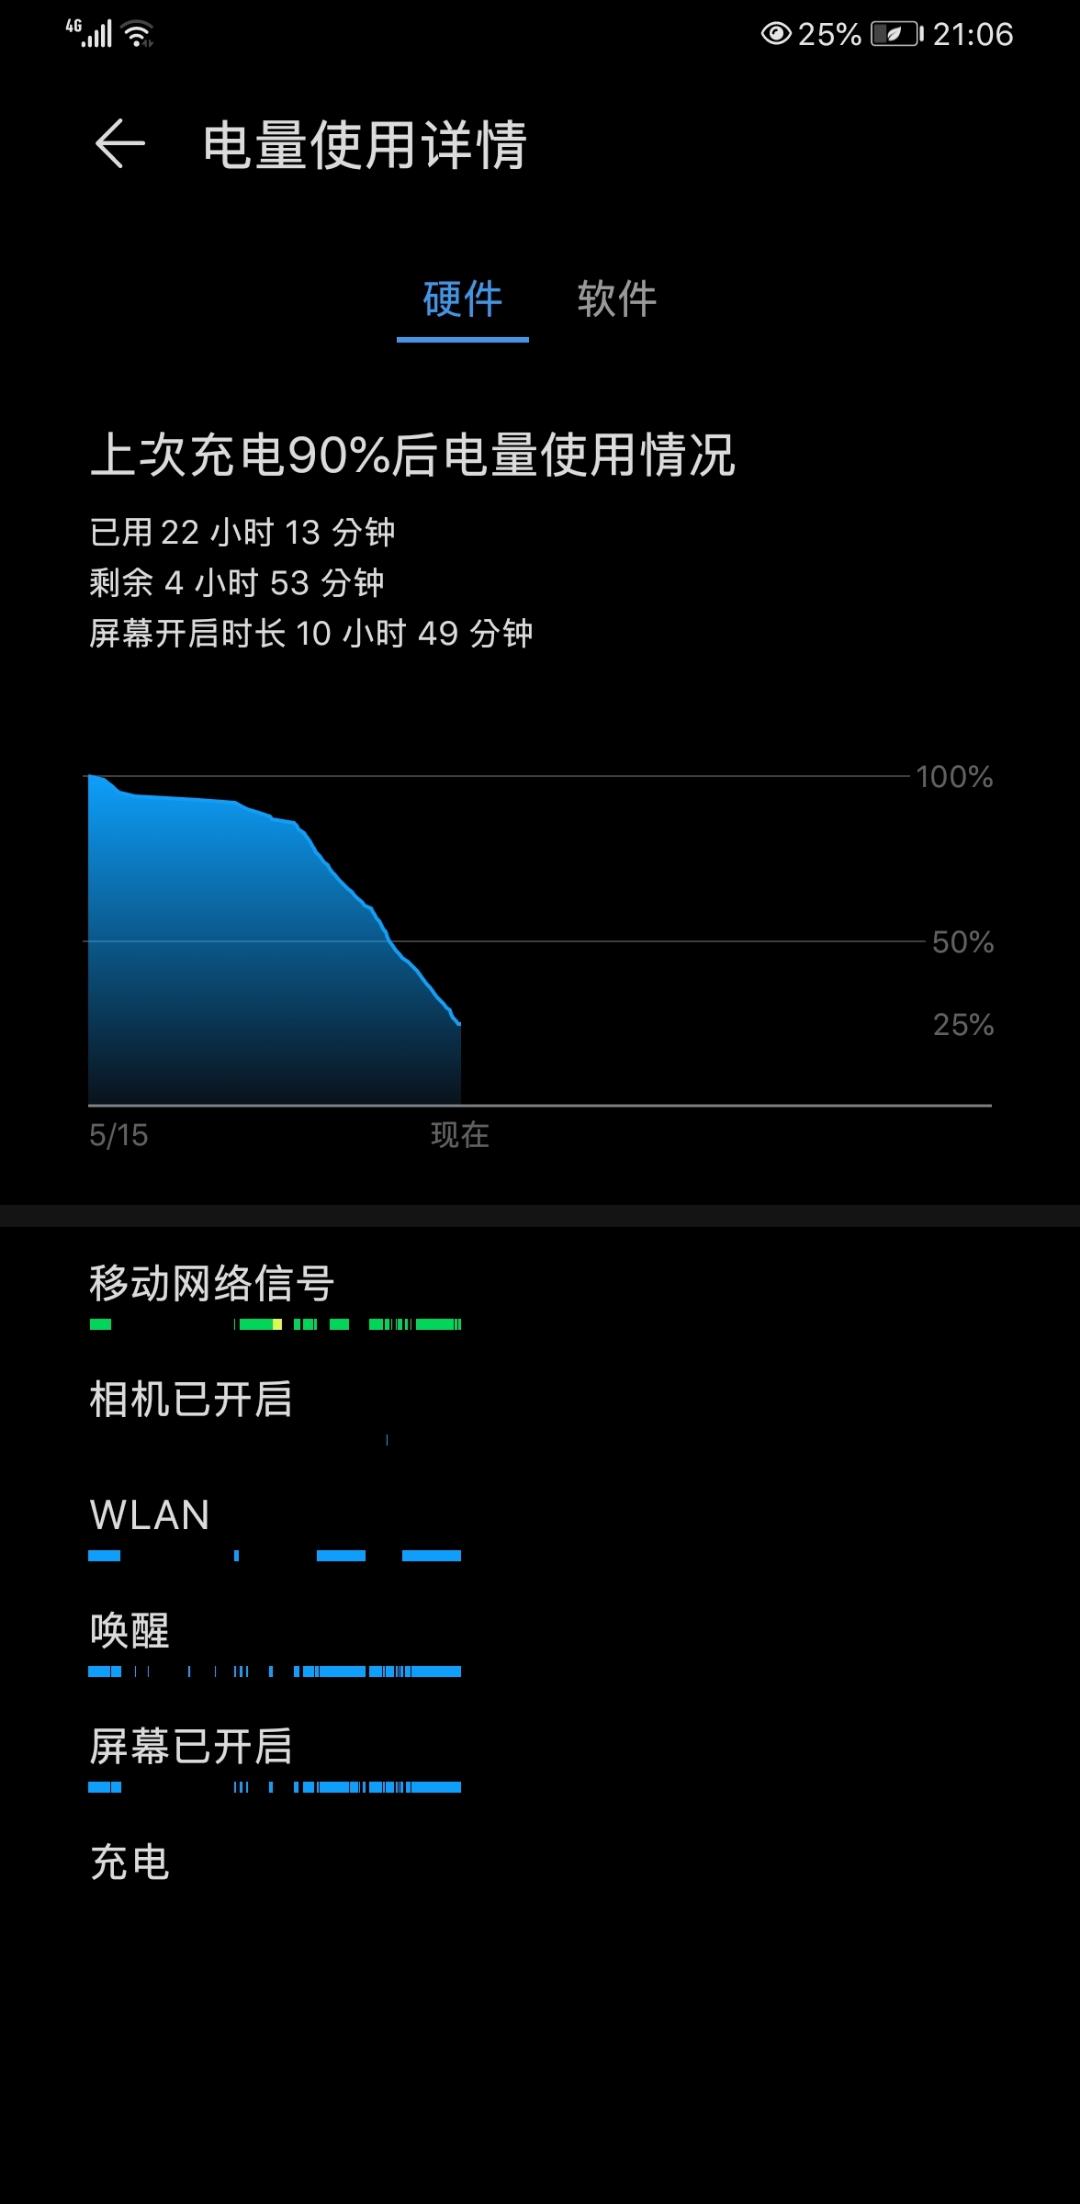 Screenshot_20200515_210657_com.huawei.systemmanager.jpg